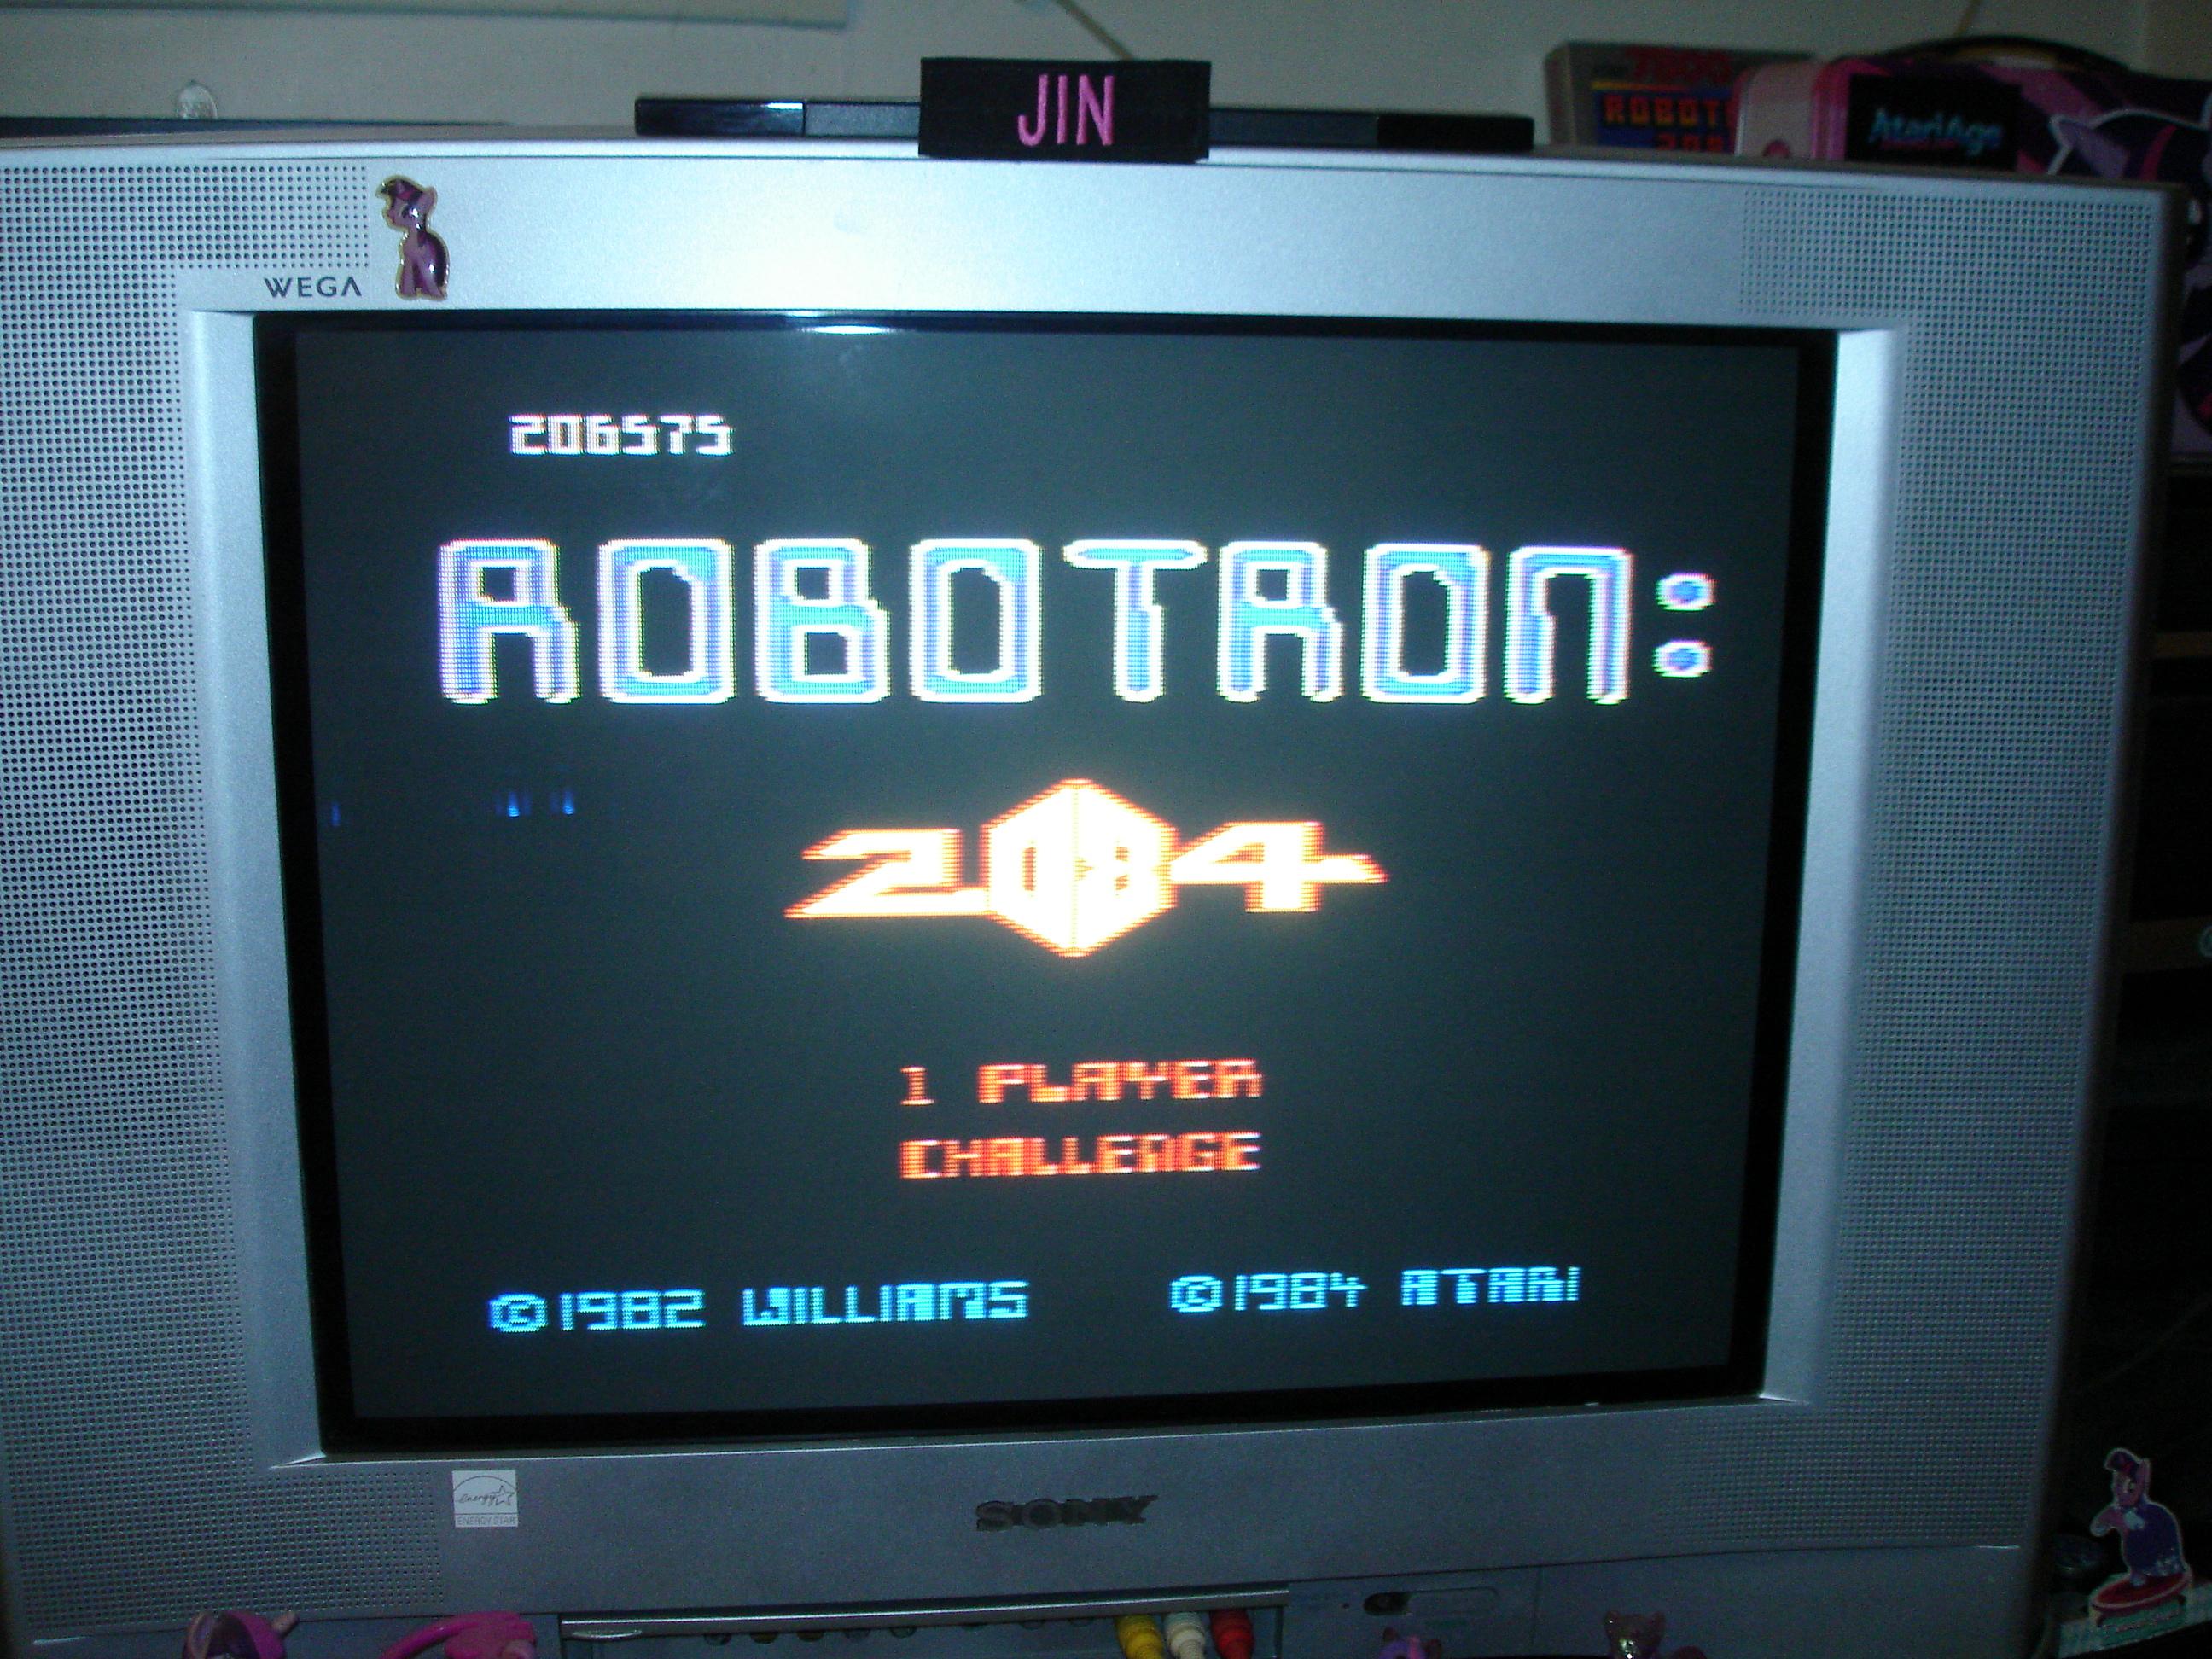 Robotron 2084: Challenge 206,575 points